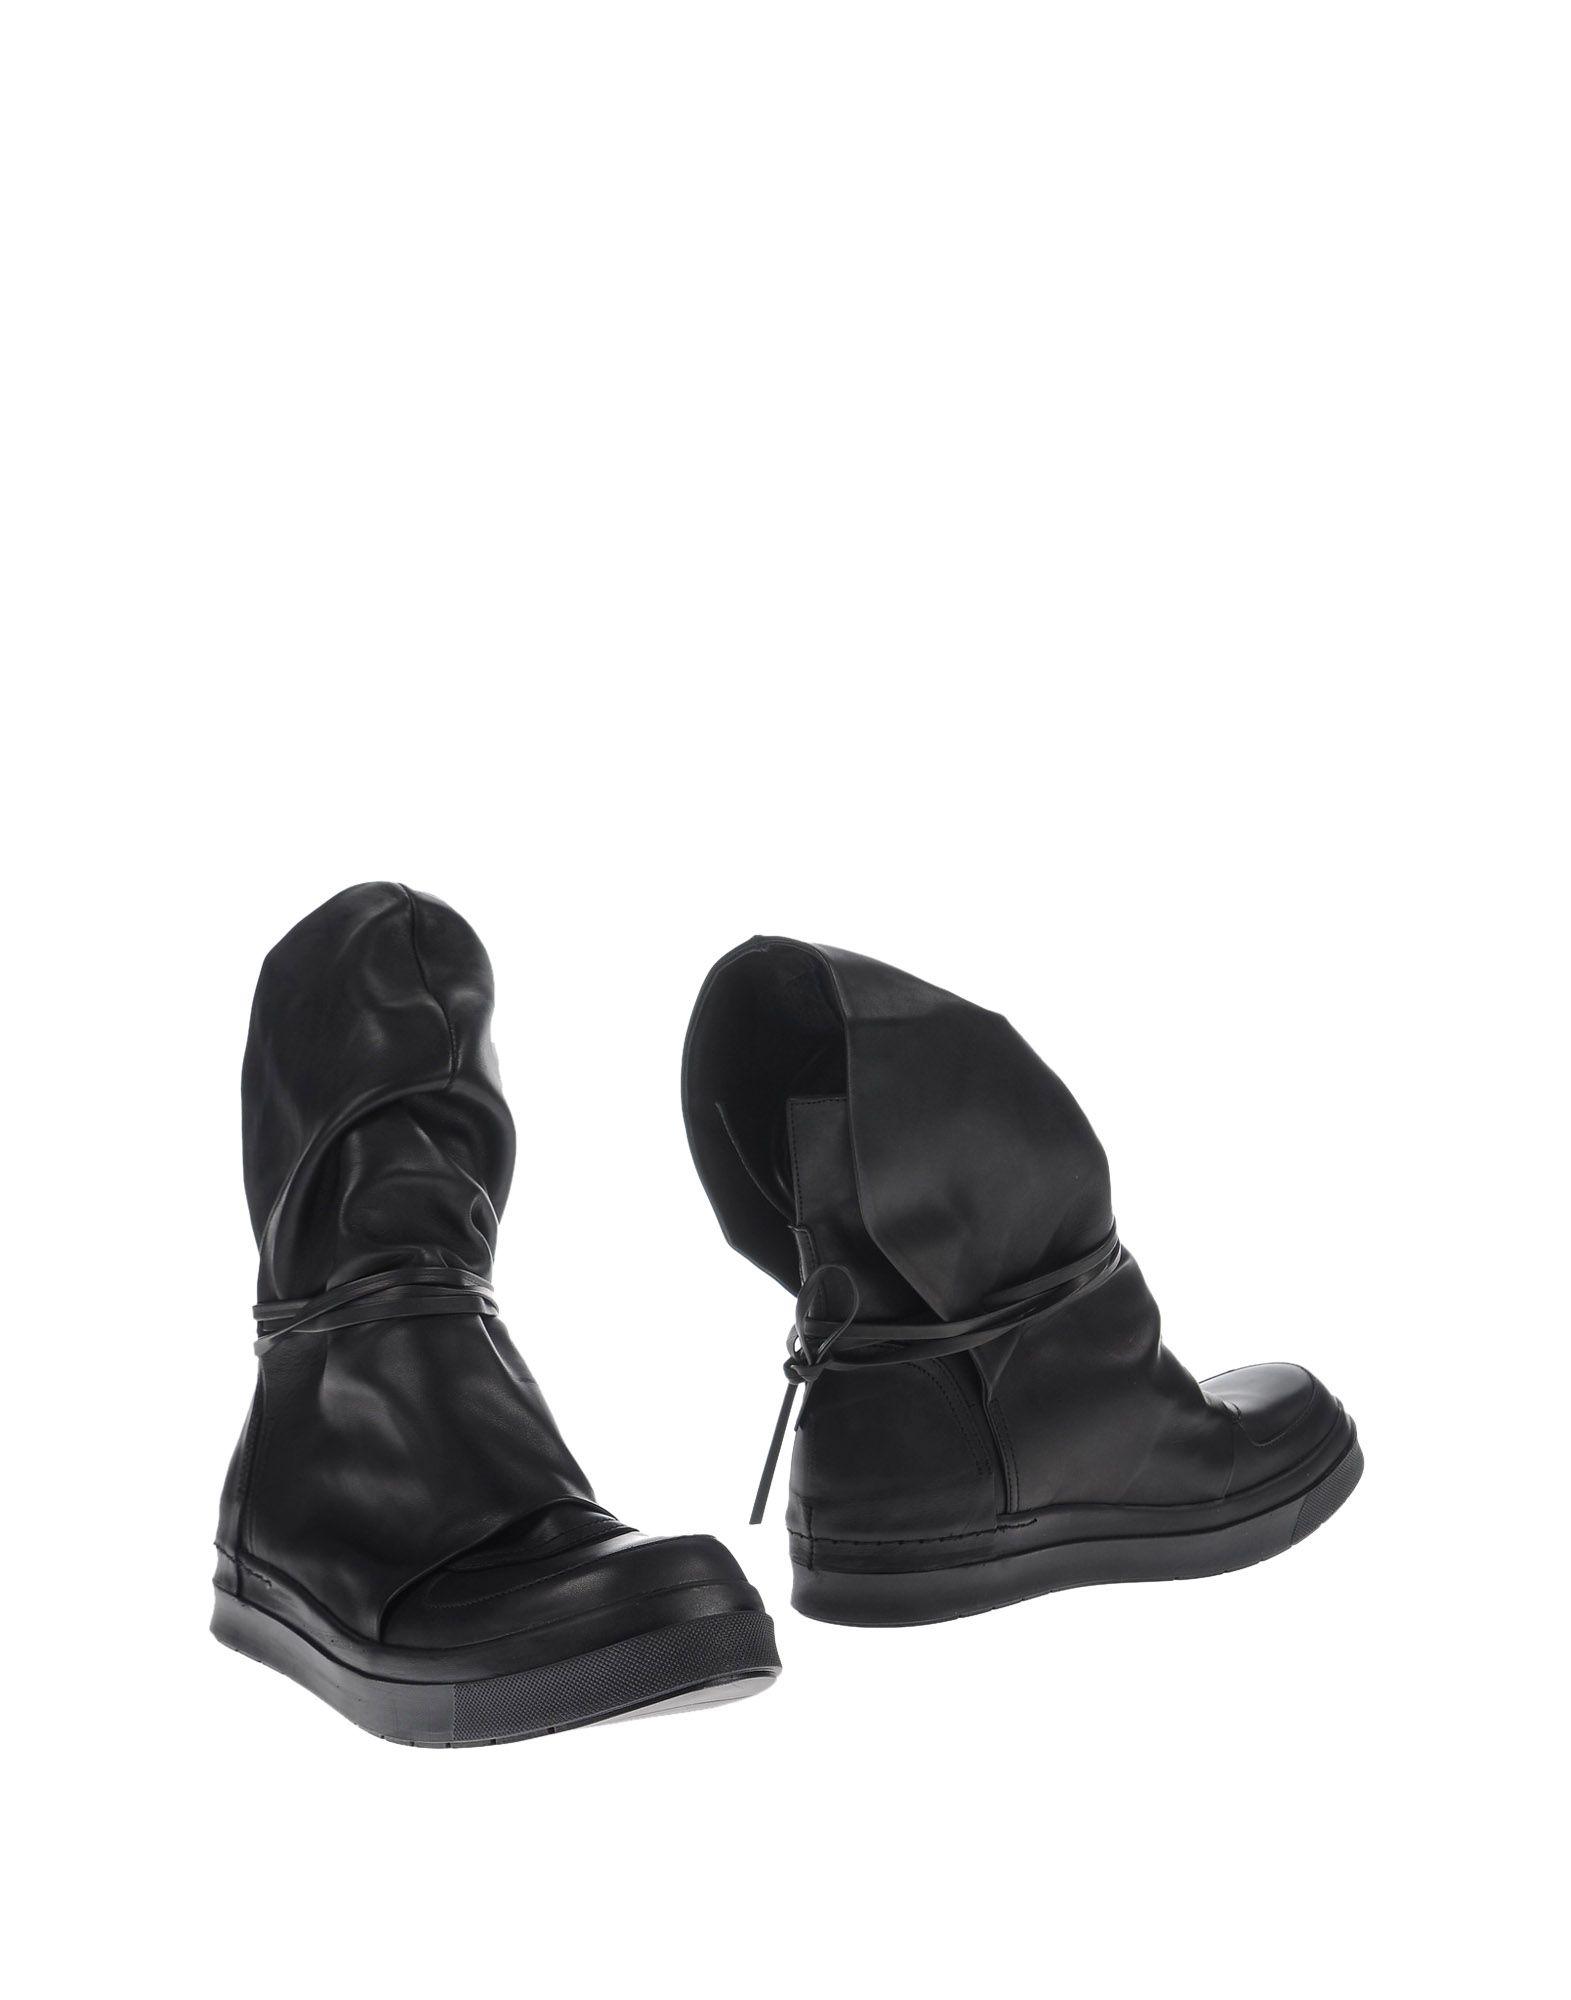 CA BY CINZIA ARAIA Boots in Black